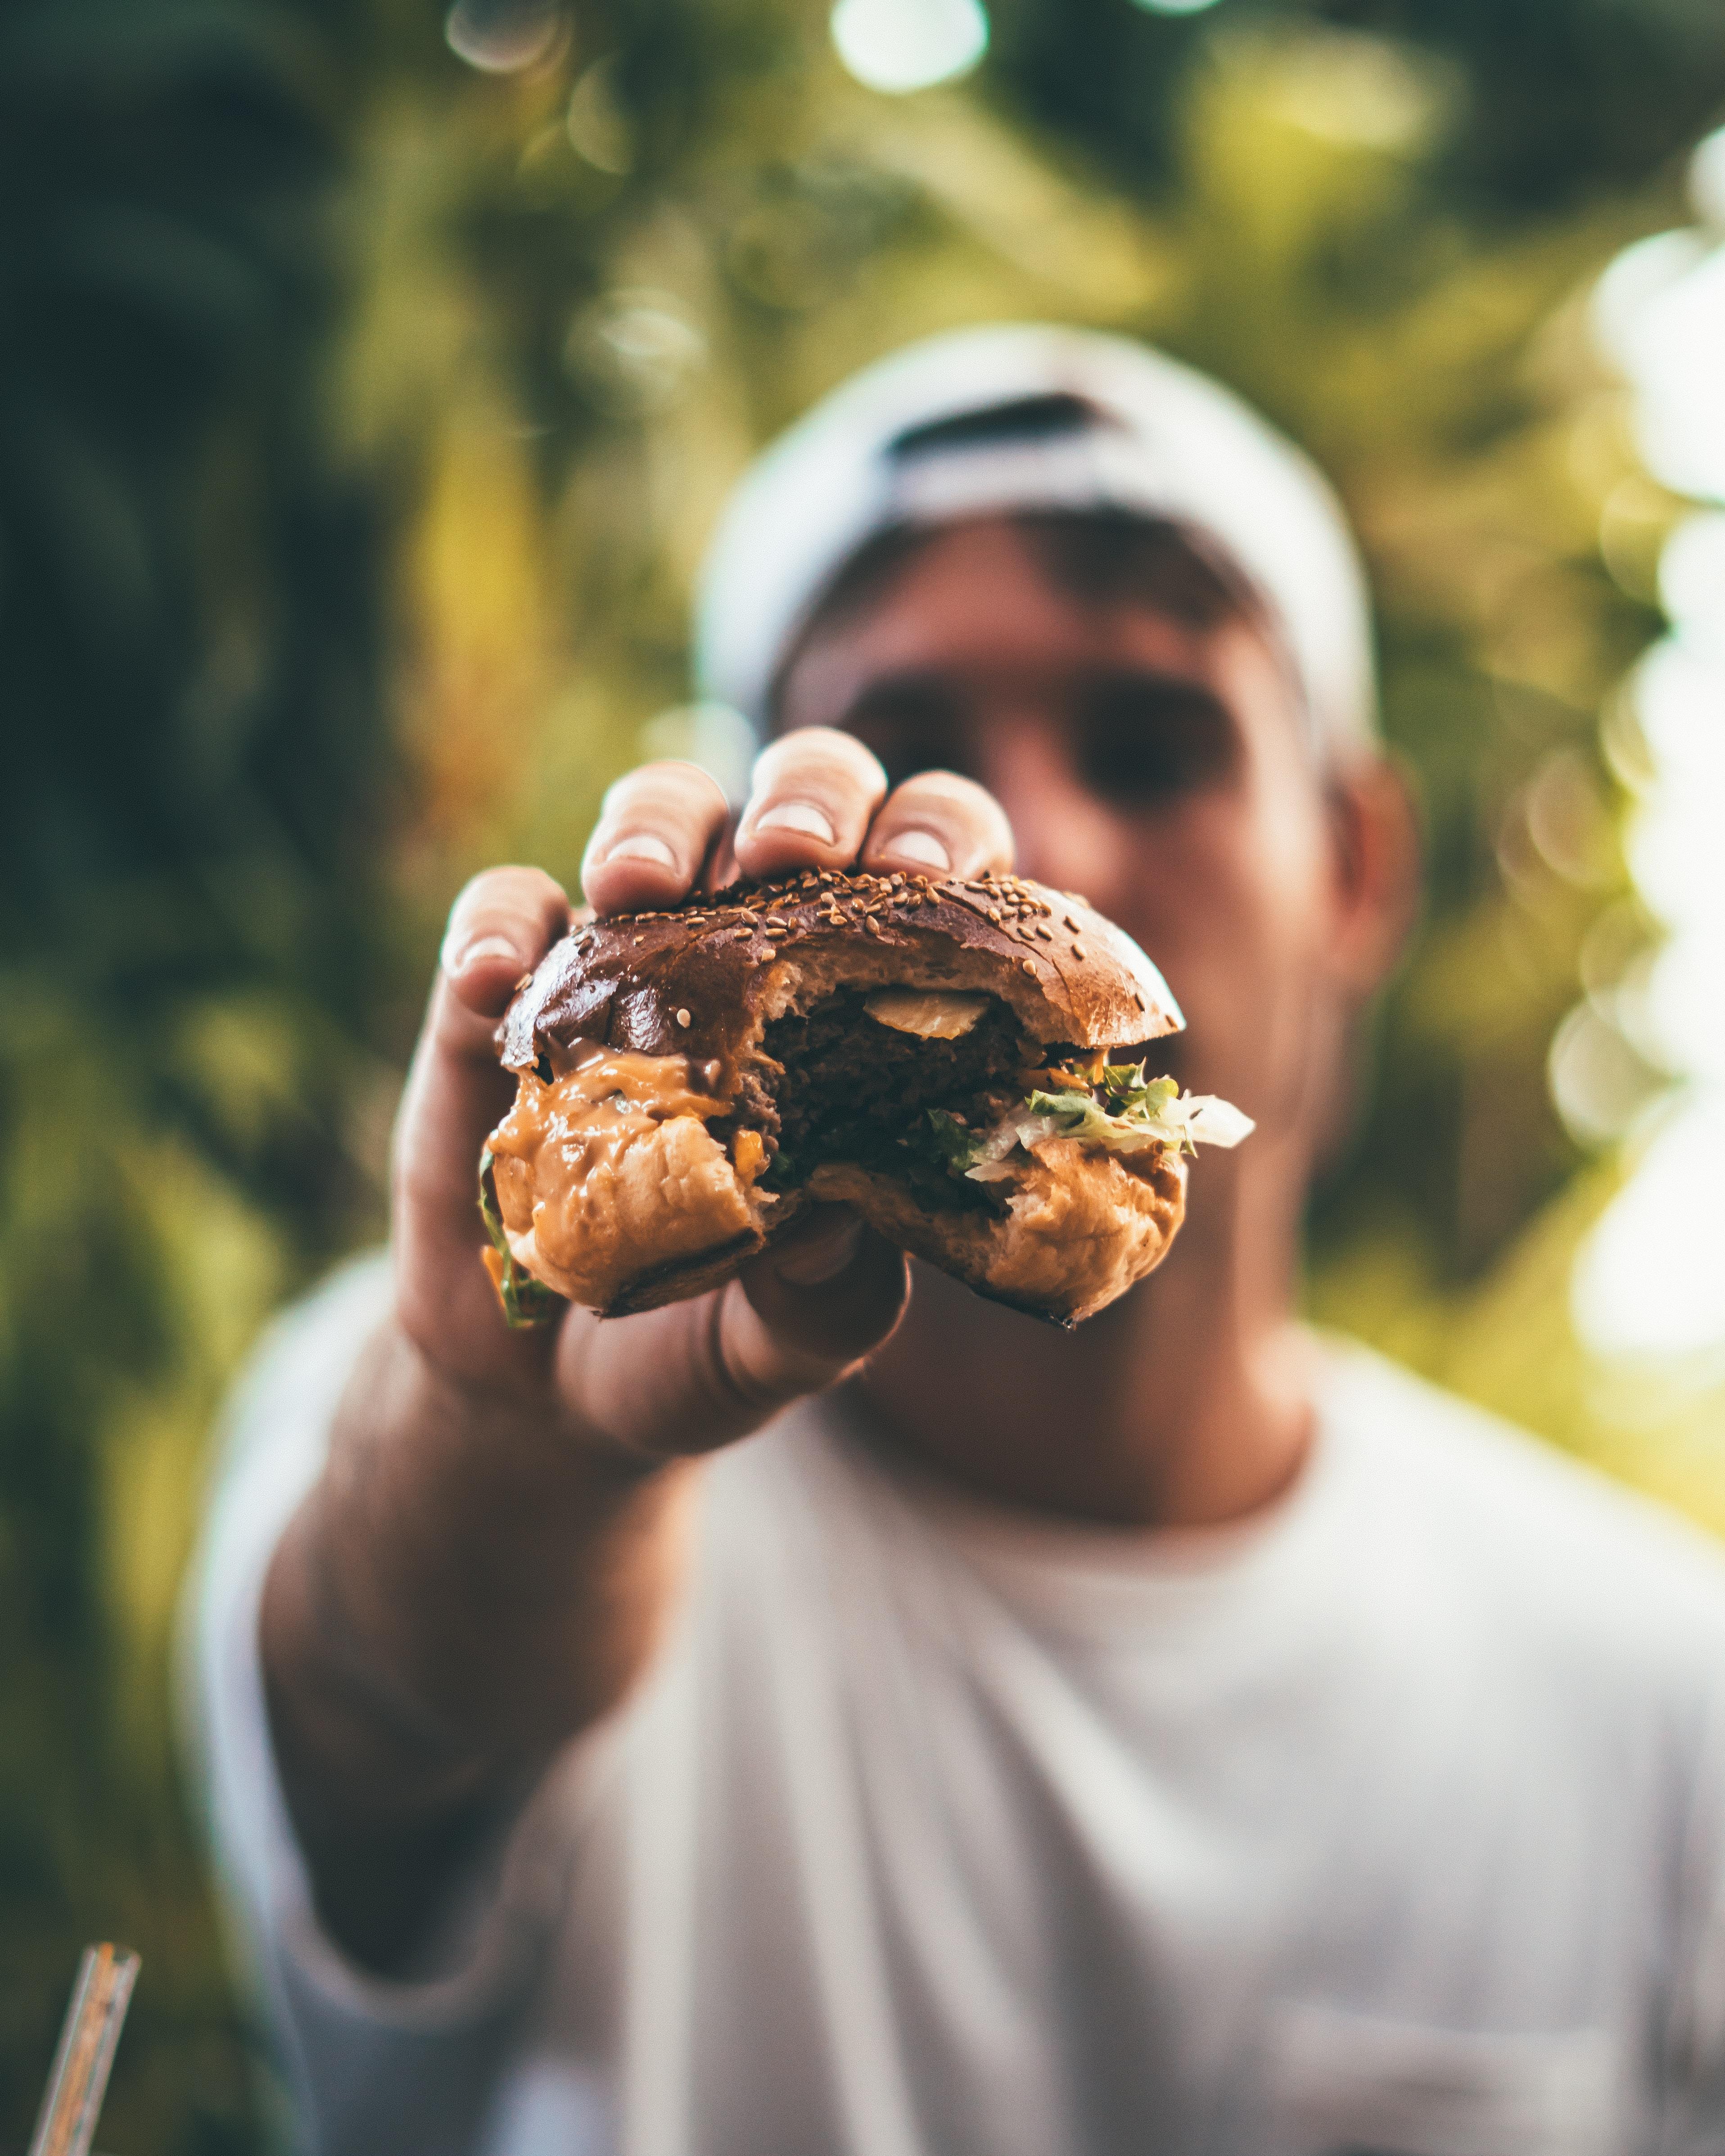 Mobile App Fraudster Binges On Big Macs